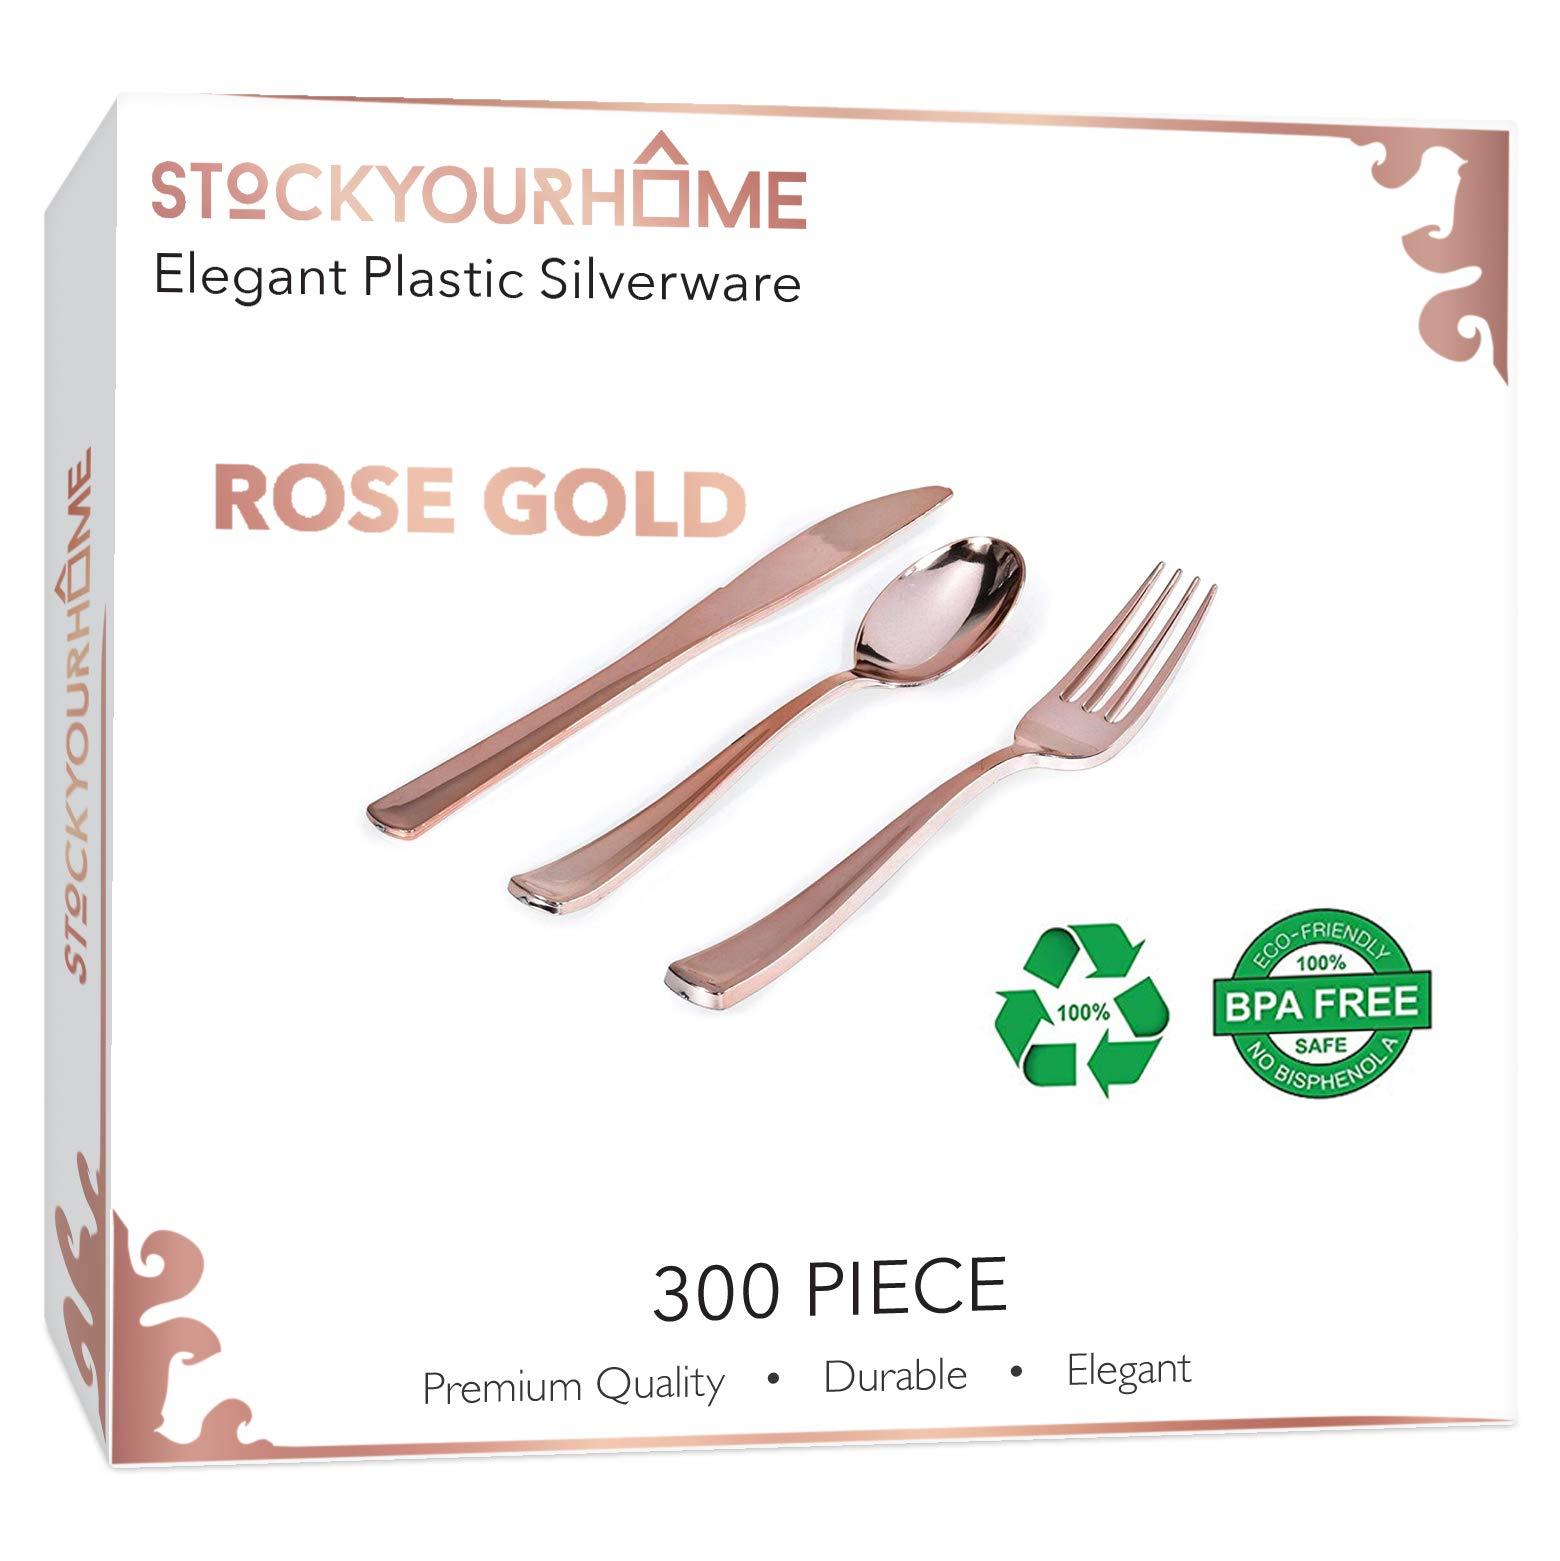 300 Rose Gold Plastic Silverware - Rose Gold Plastic Cutlery – Rose Gold Plastic Flatware – Rose Gold Utensils - 100 Rose Gold Plastic Forks, 100 Rose Gold Plastic Spoons, 100 Rose Gold Plastic Knives